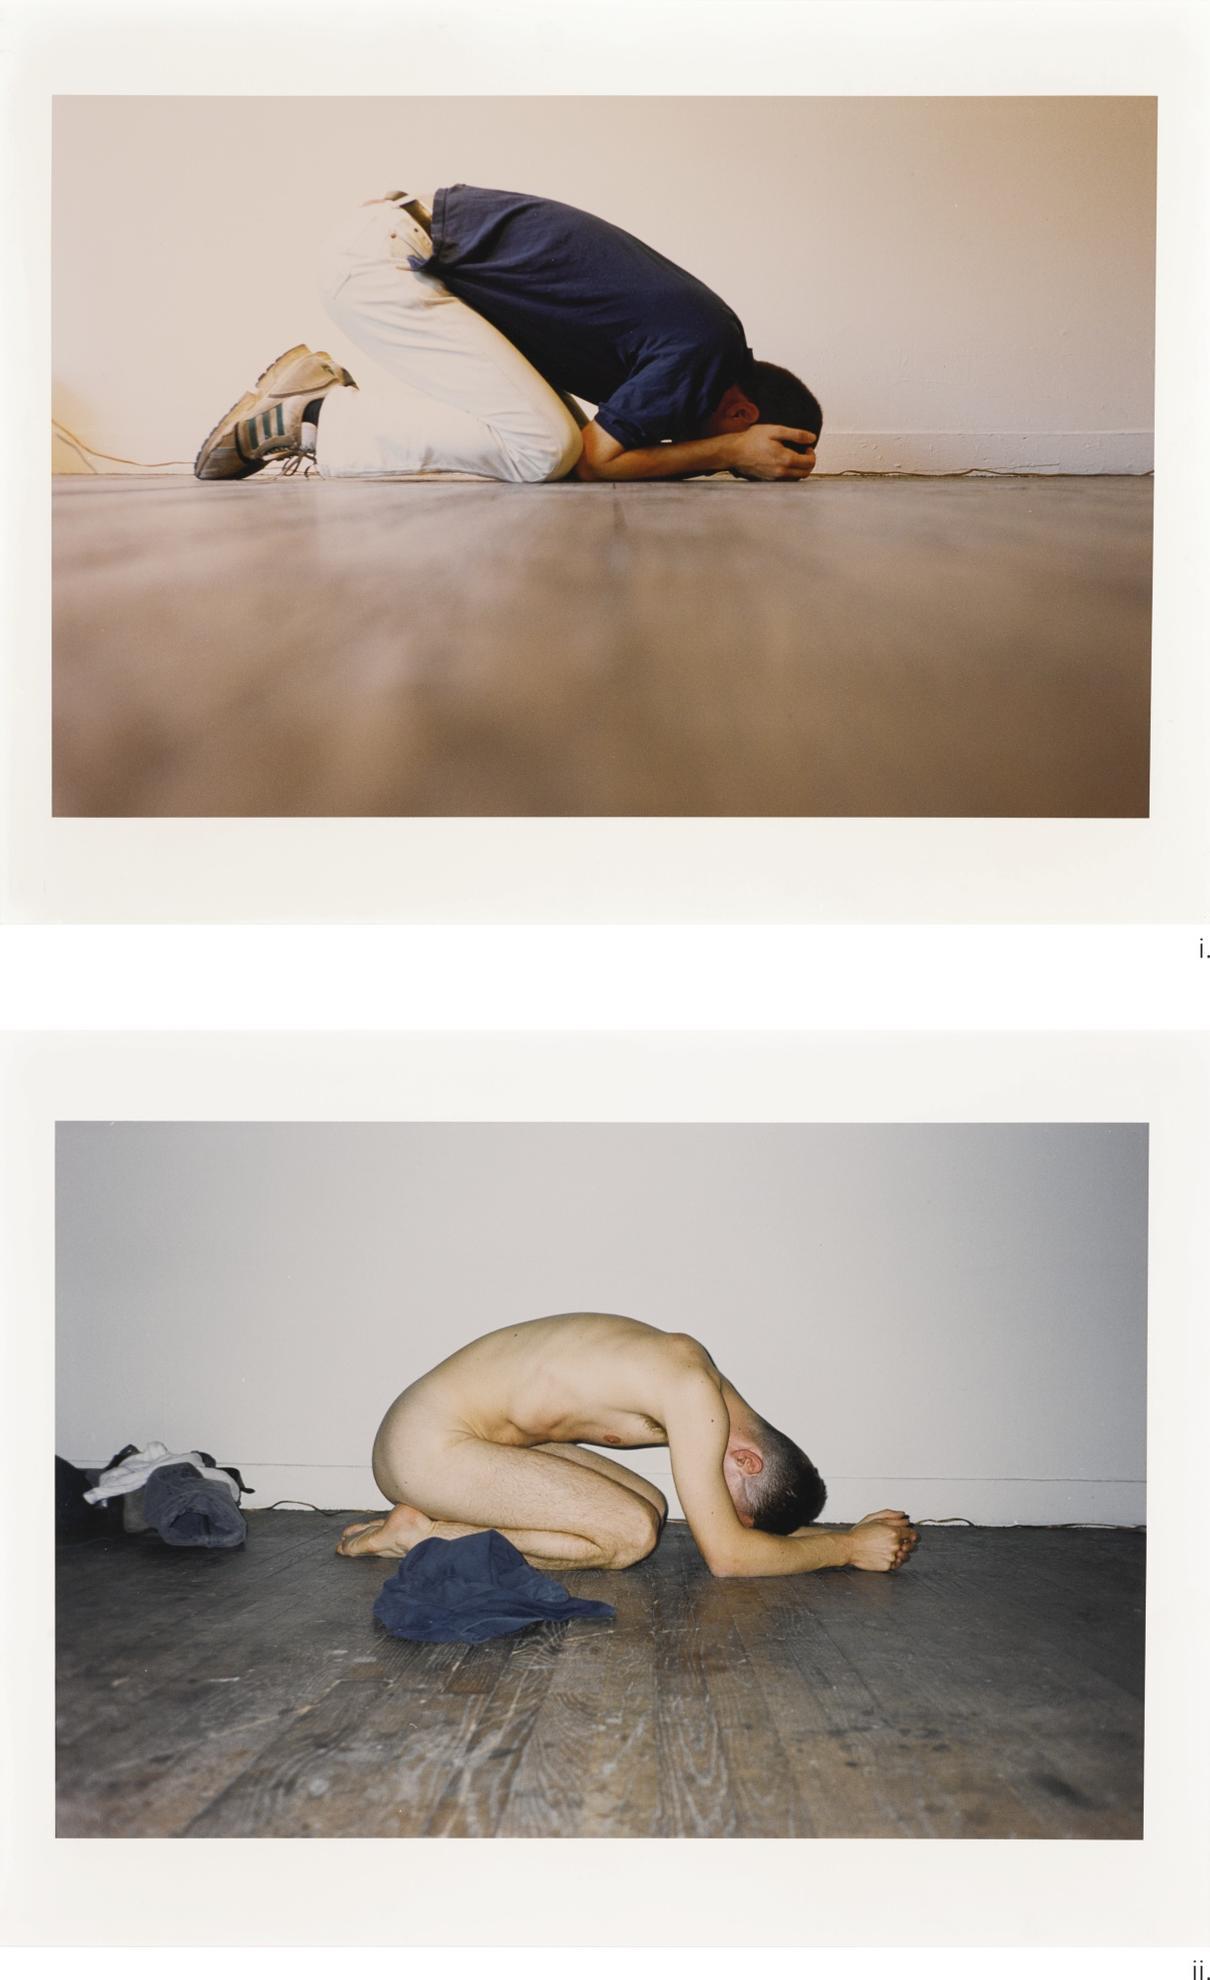 Wolfgang Tillmans-(i) Like Praying I (ii) Like Praying II-1994